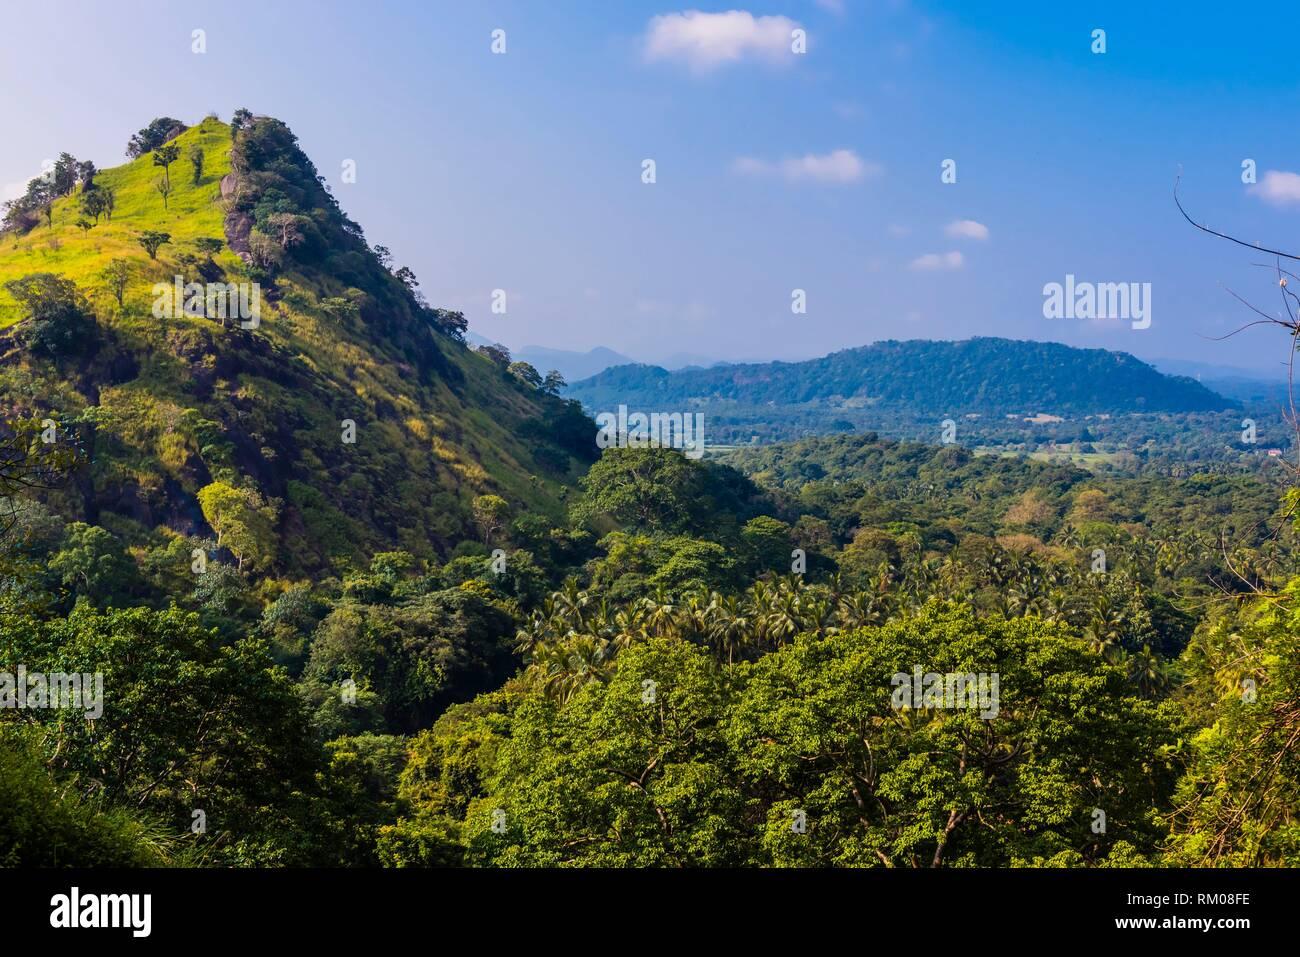 Mountains, Dambulla, Central Province, Sri Lanka. Stock Photo